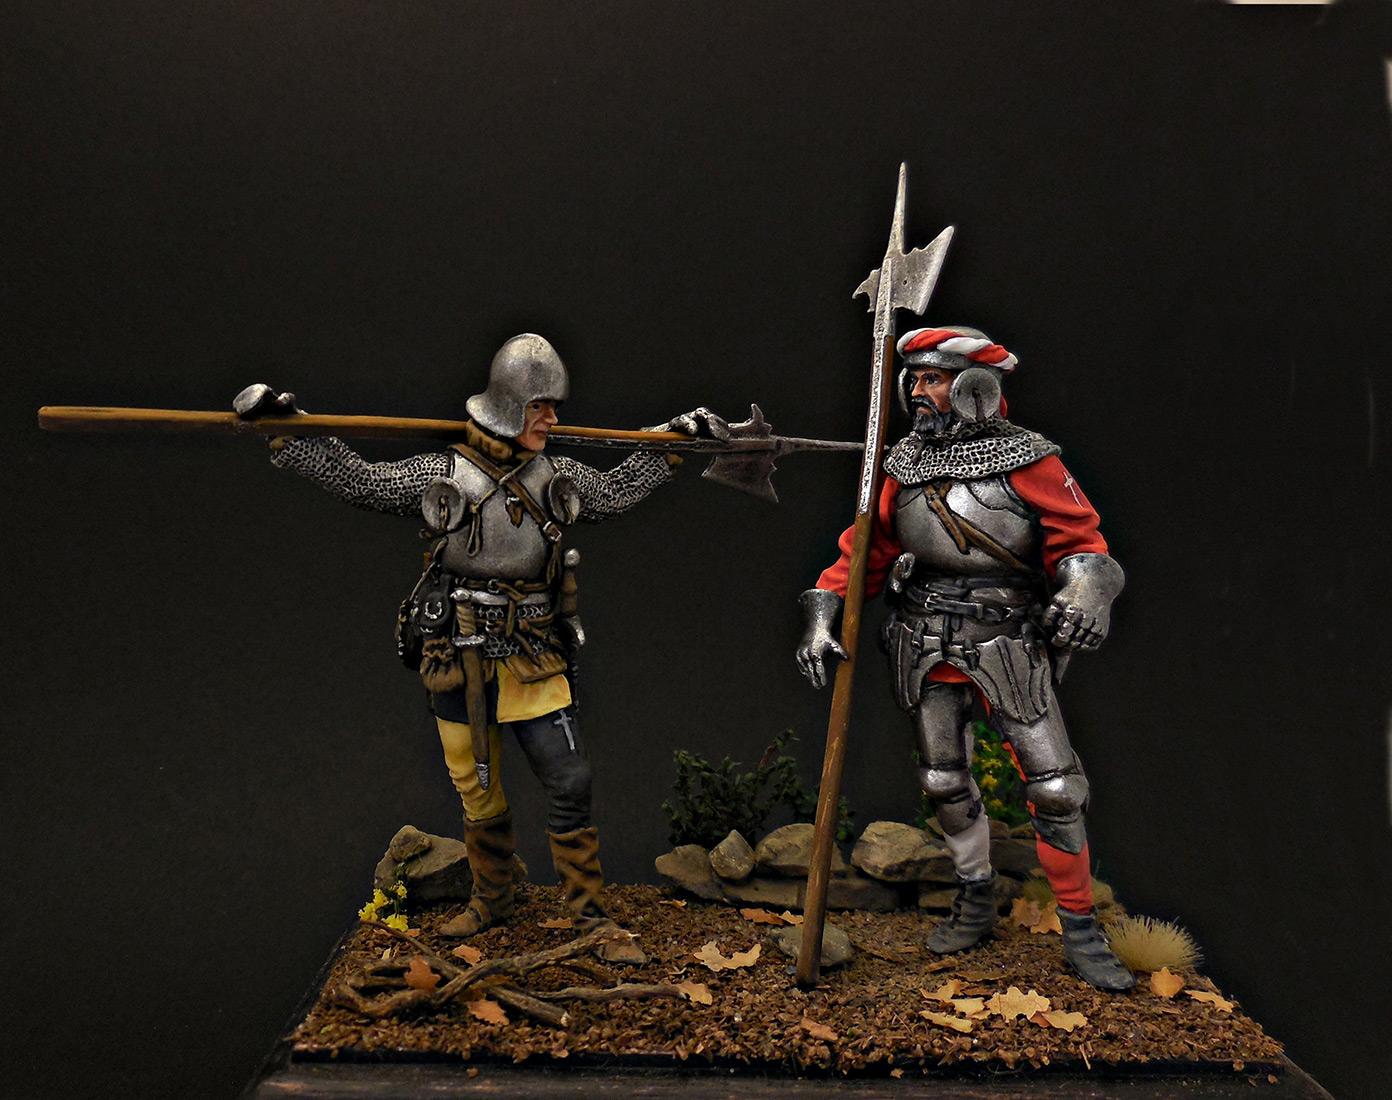 Figures: Swiss guards, photo #1